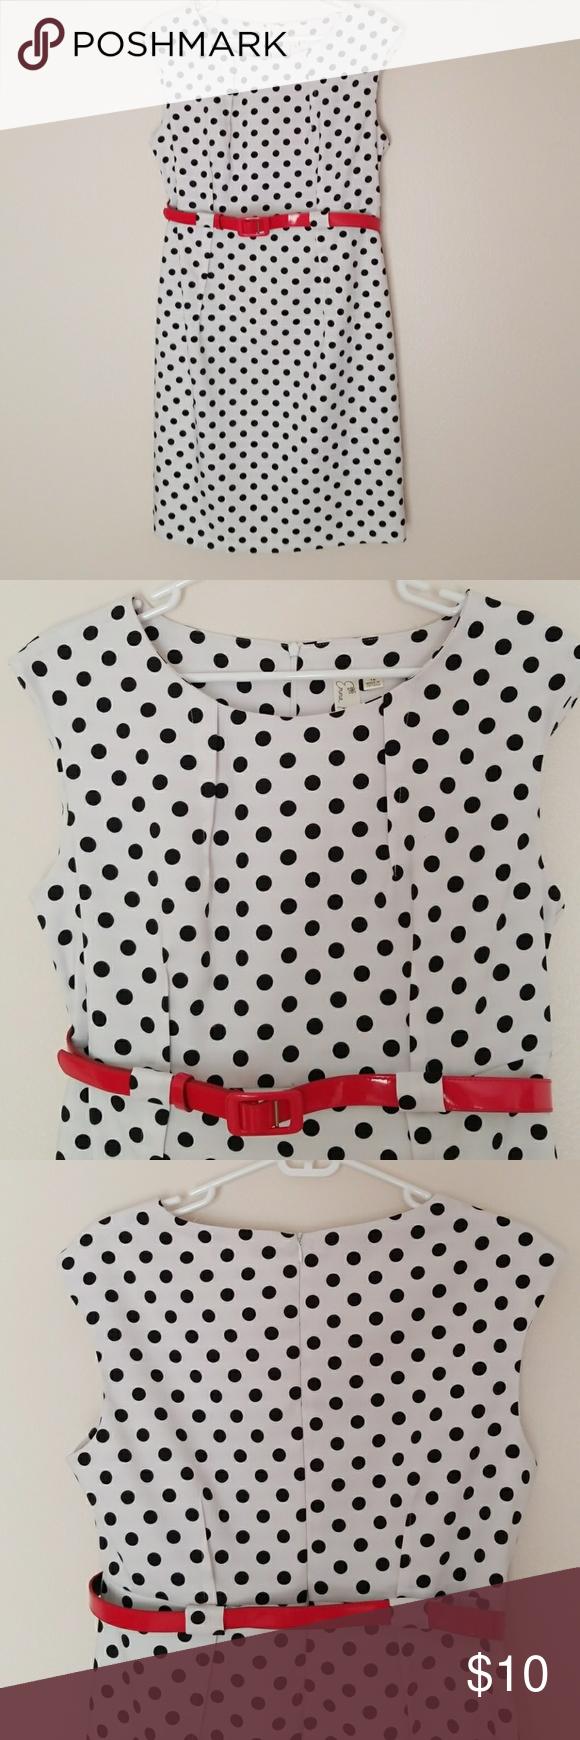 White polka dot dress white polka dot dress red belt and darts